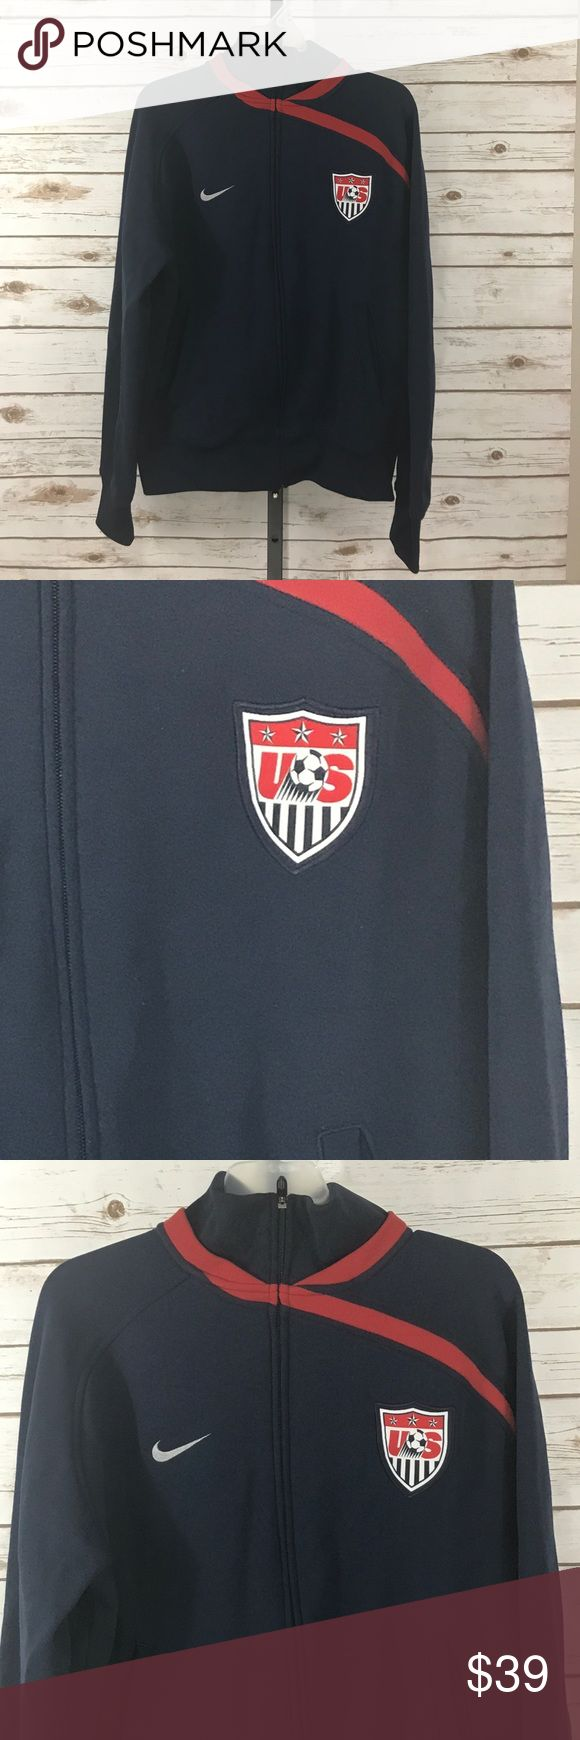 Nike Men's USA Soccer Jacket (M4942) Men's Nike Team USA Soccer Jacket. Some minor pilling. Nike Jackets & Coats